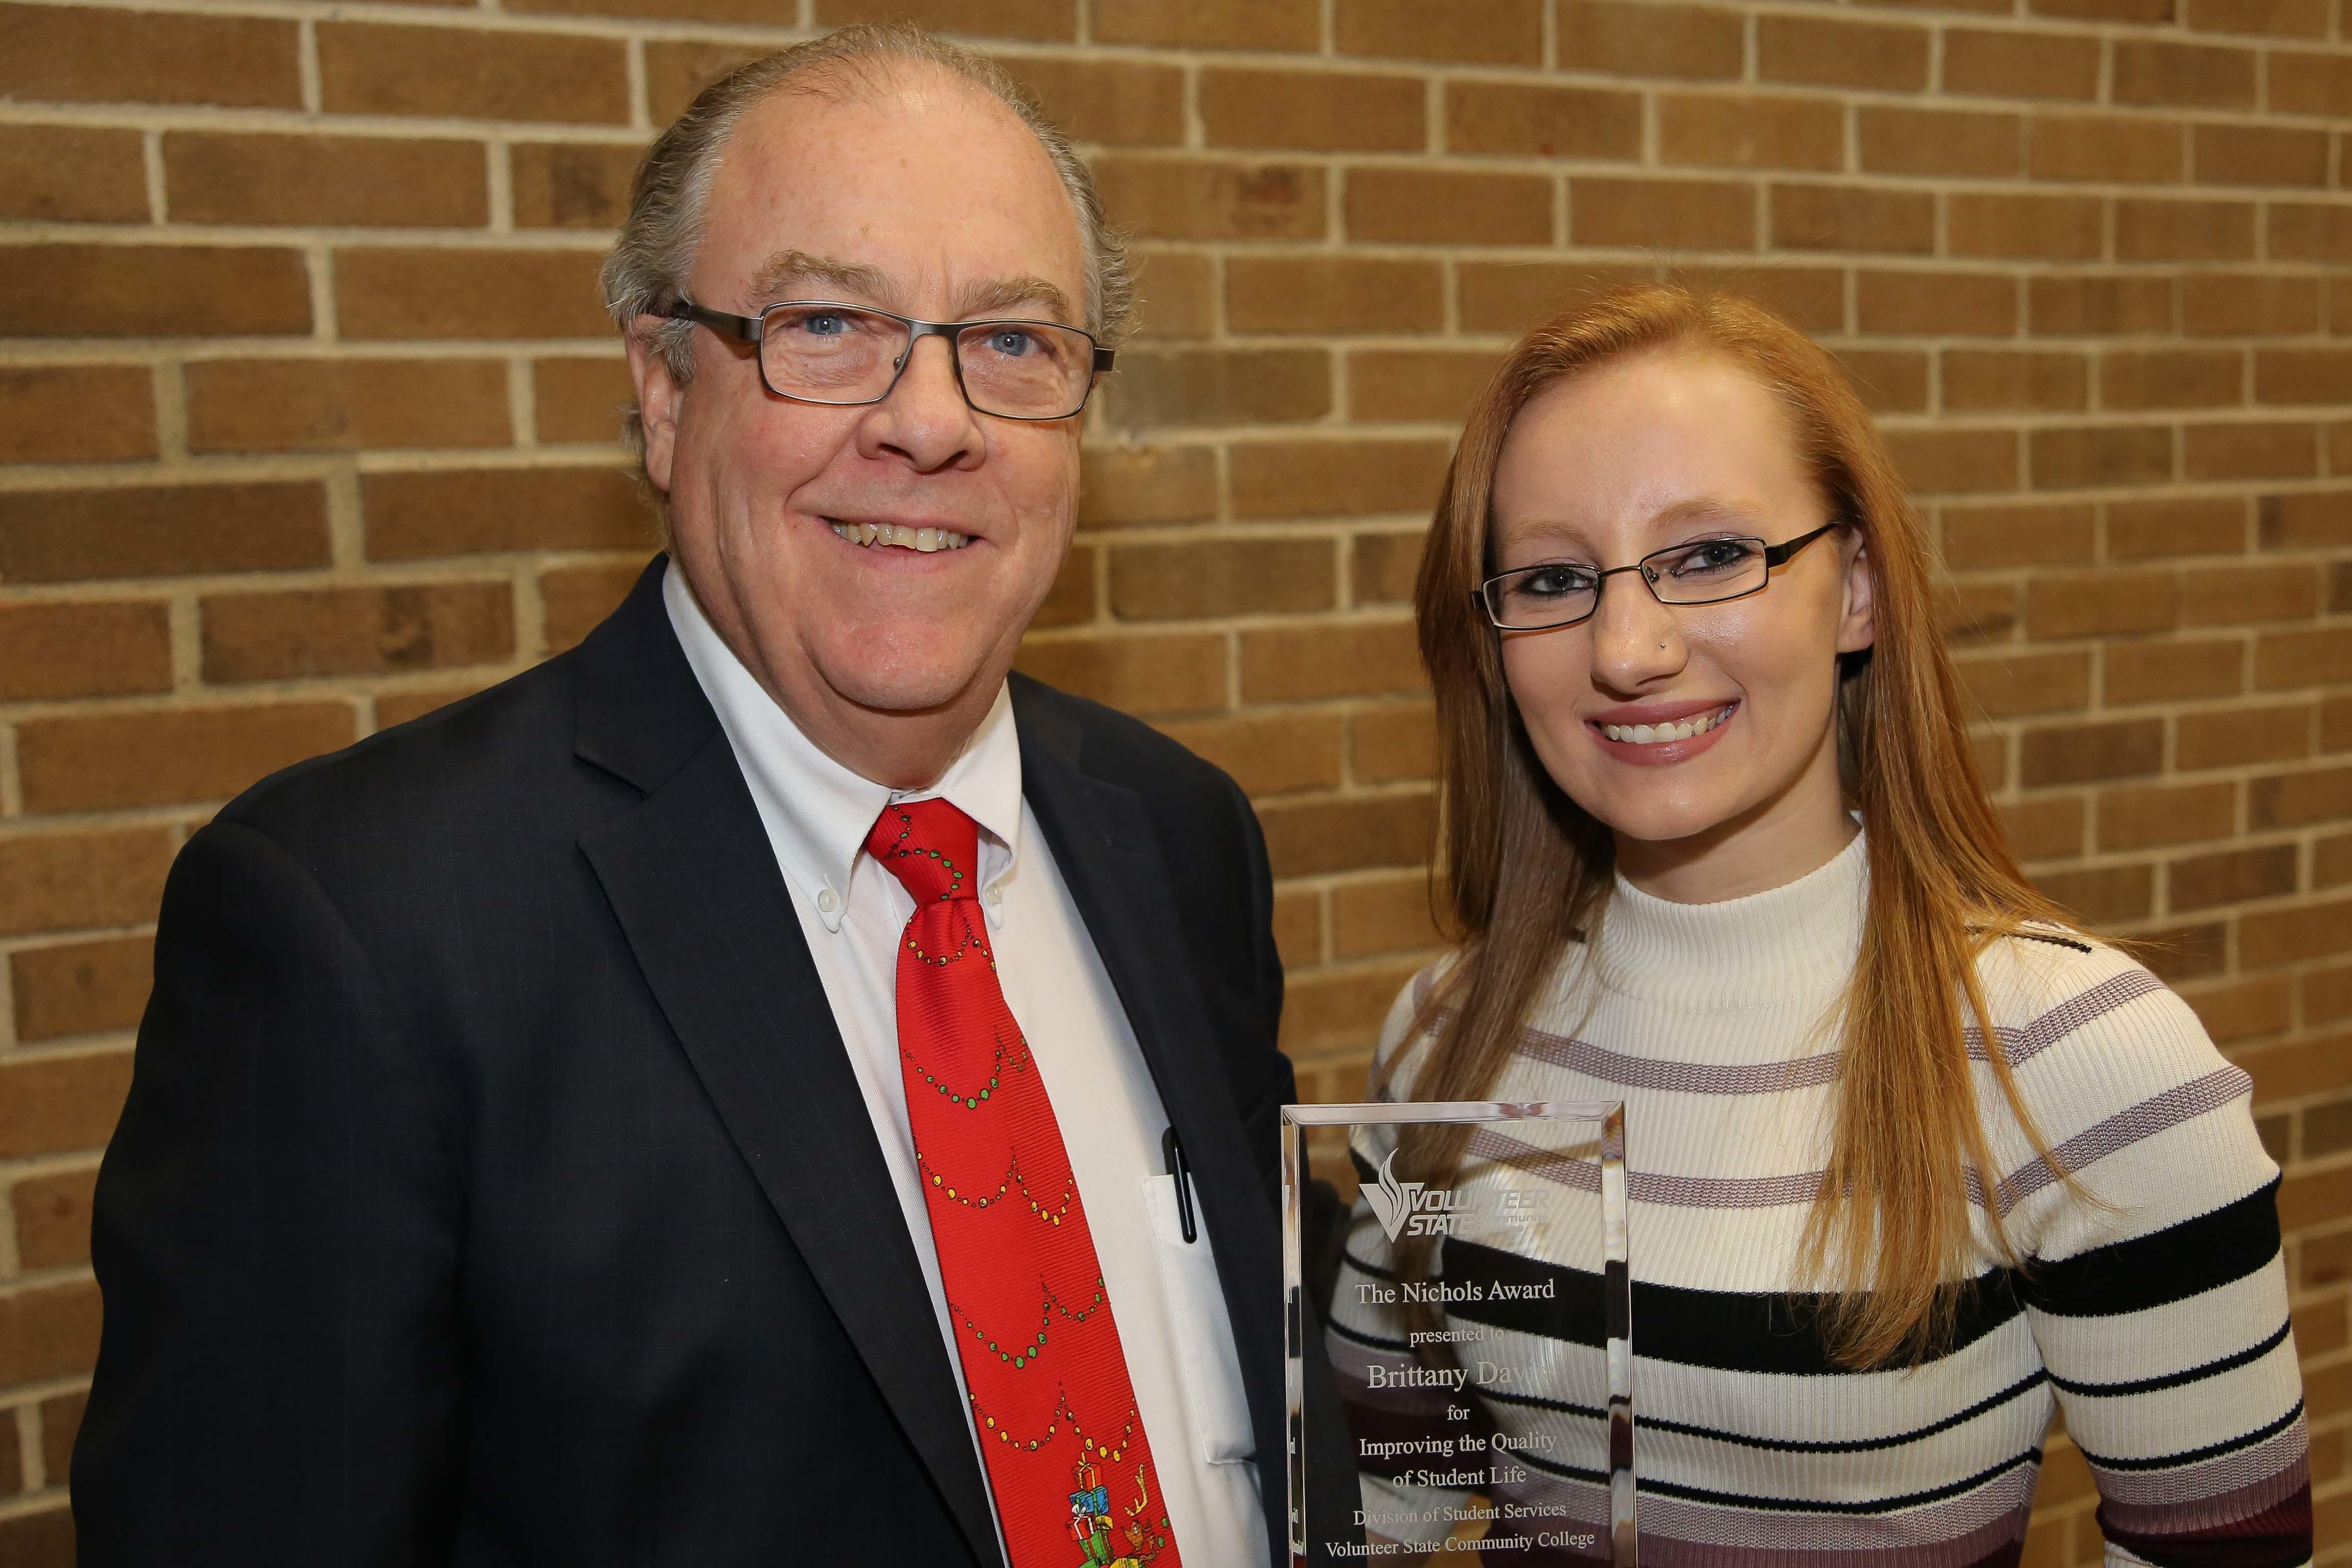 Brittany davis award 1 of 1